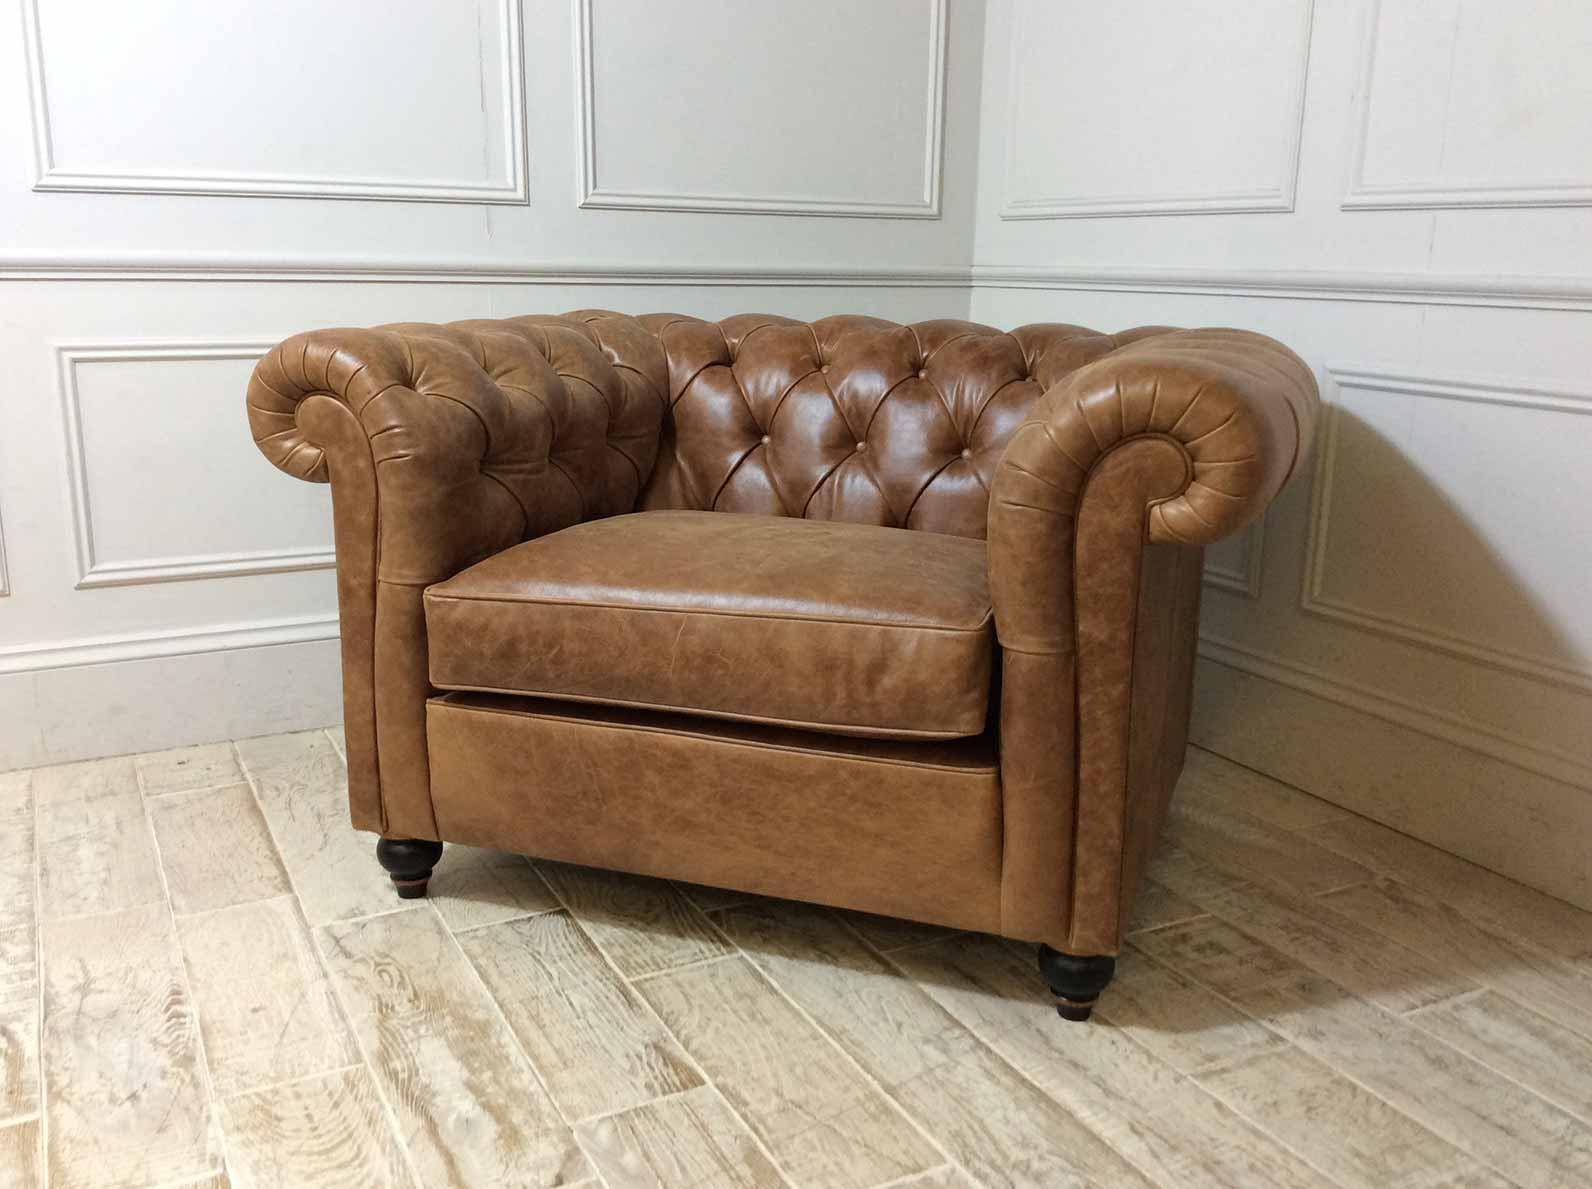 Duresta Connaught Leather Haig Chair in Clyde Oak